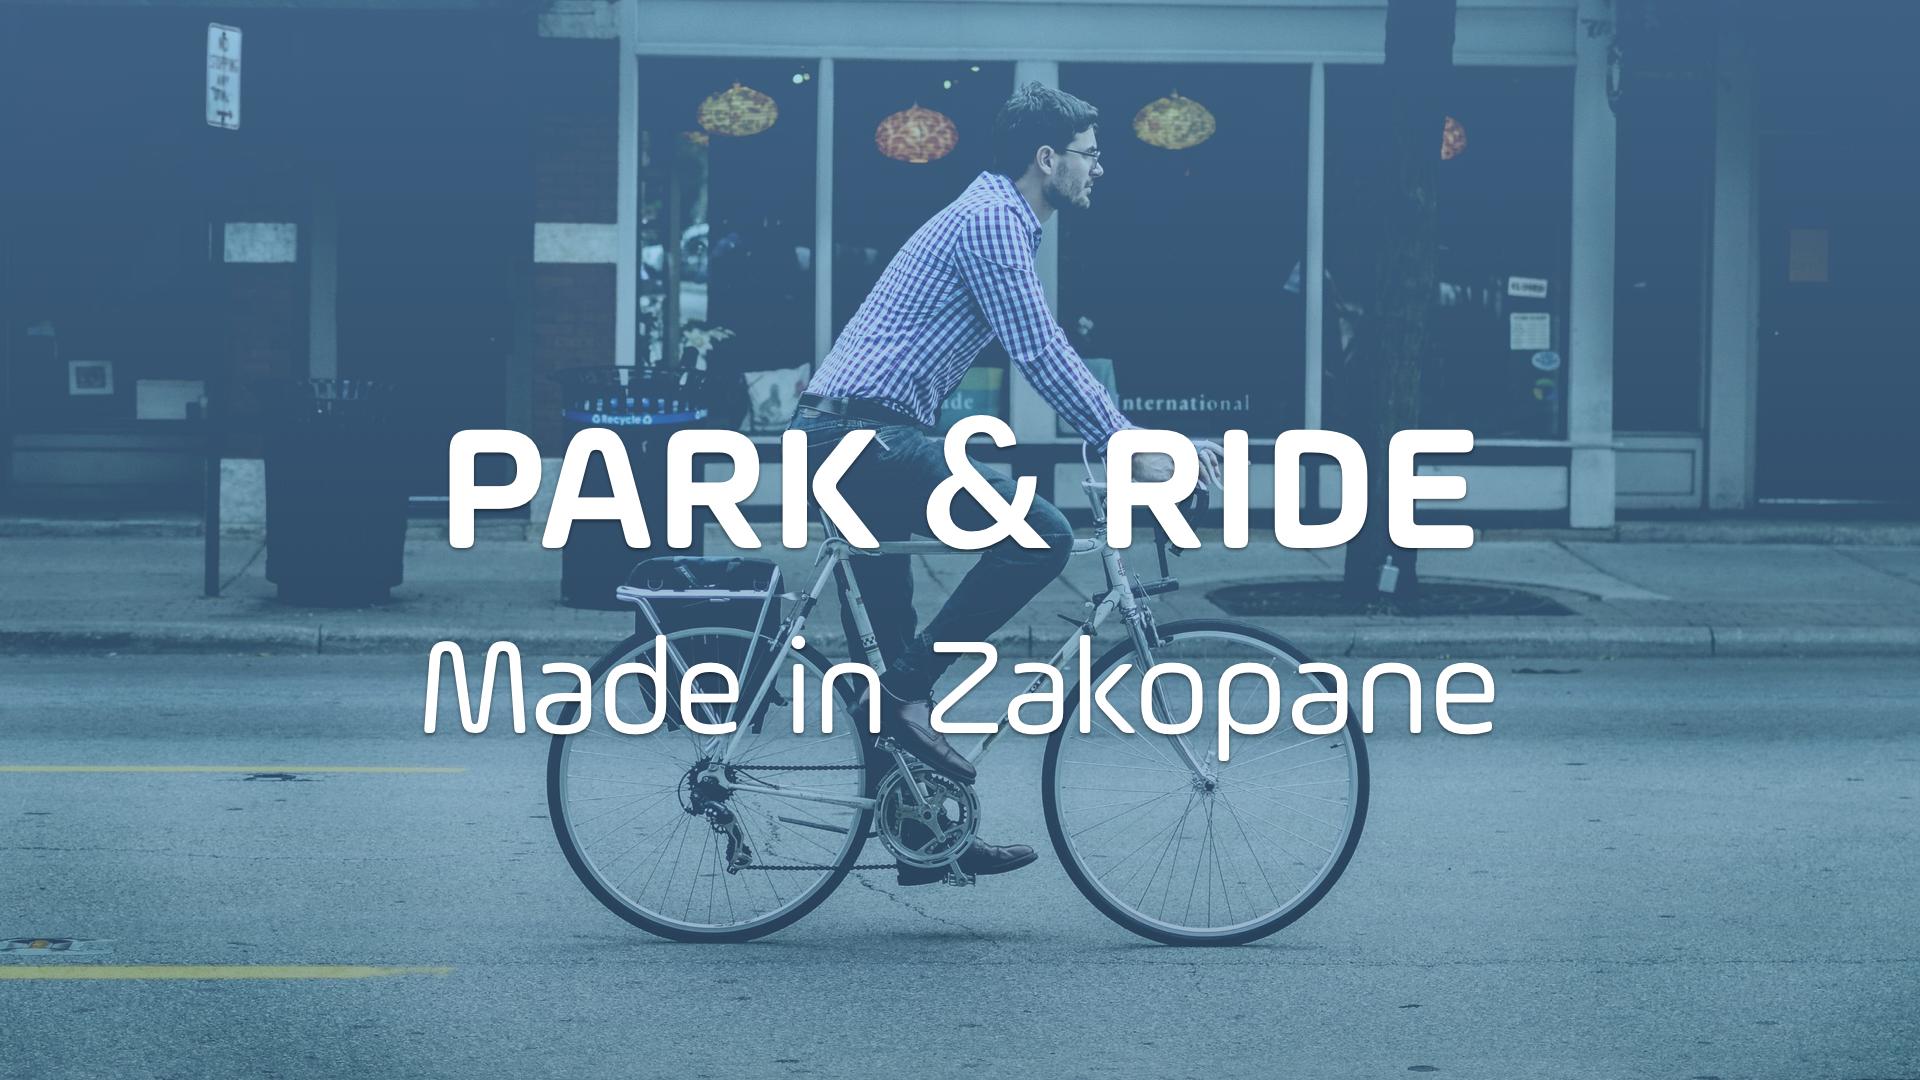 Projekt Park & Ride, czyli rowerem po Zakopanem